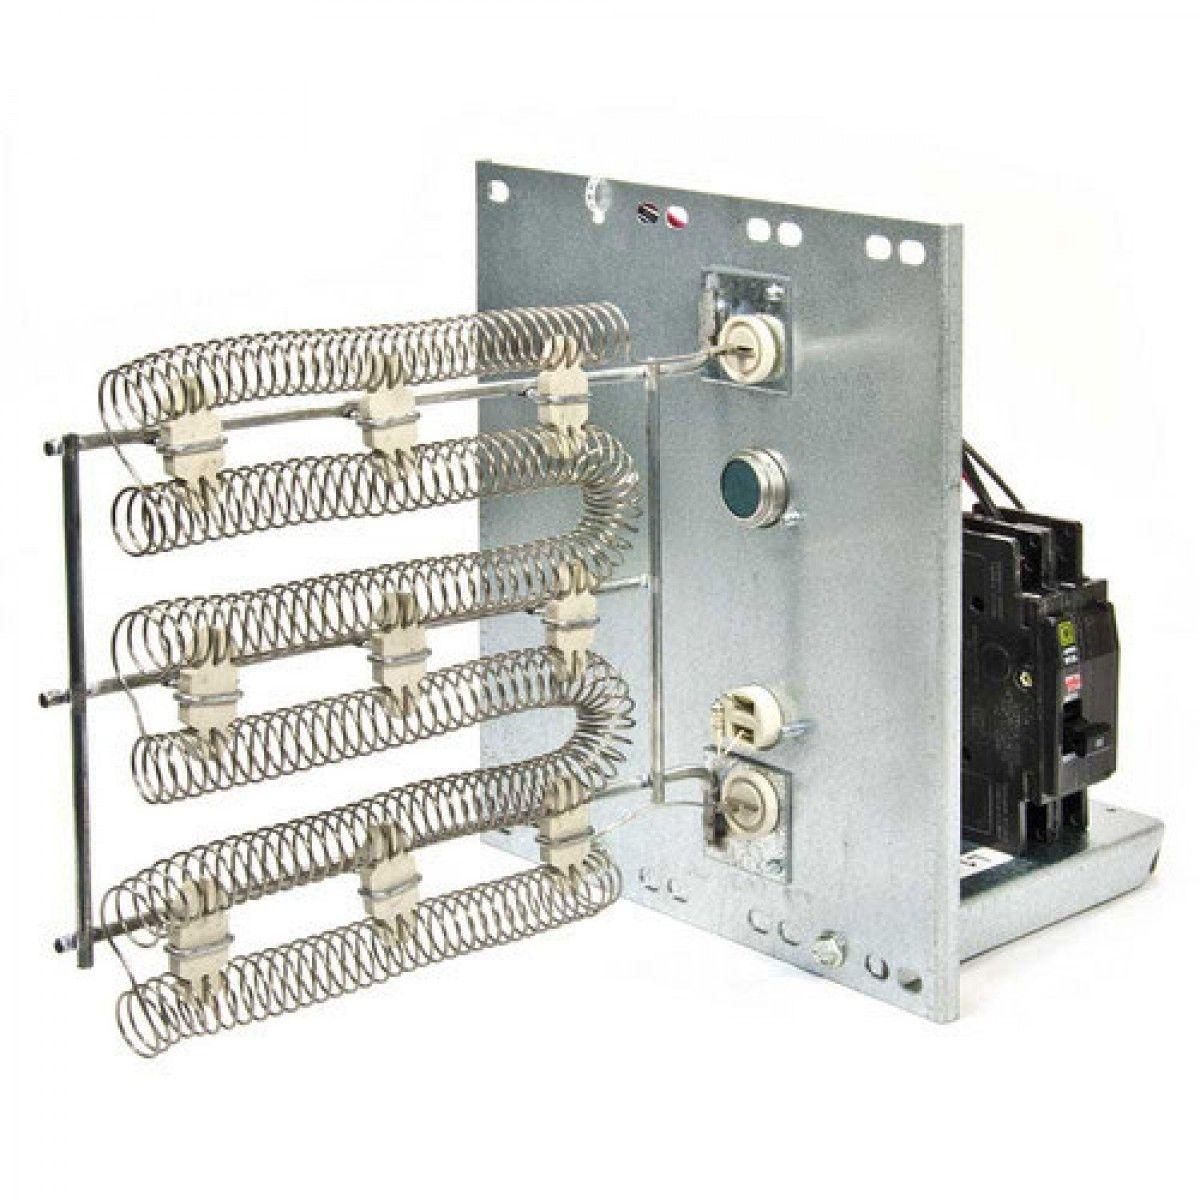 hight resolution of 25kw goodman hksc25xc electric heat kit w breaker for air handlers